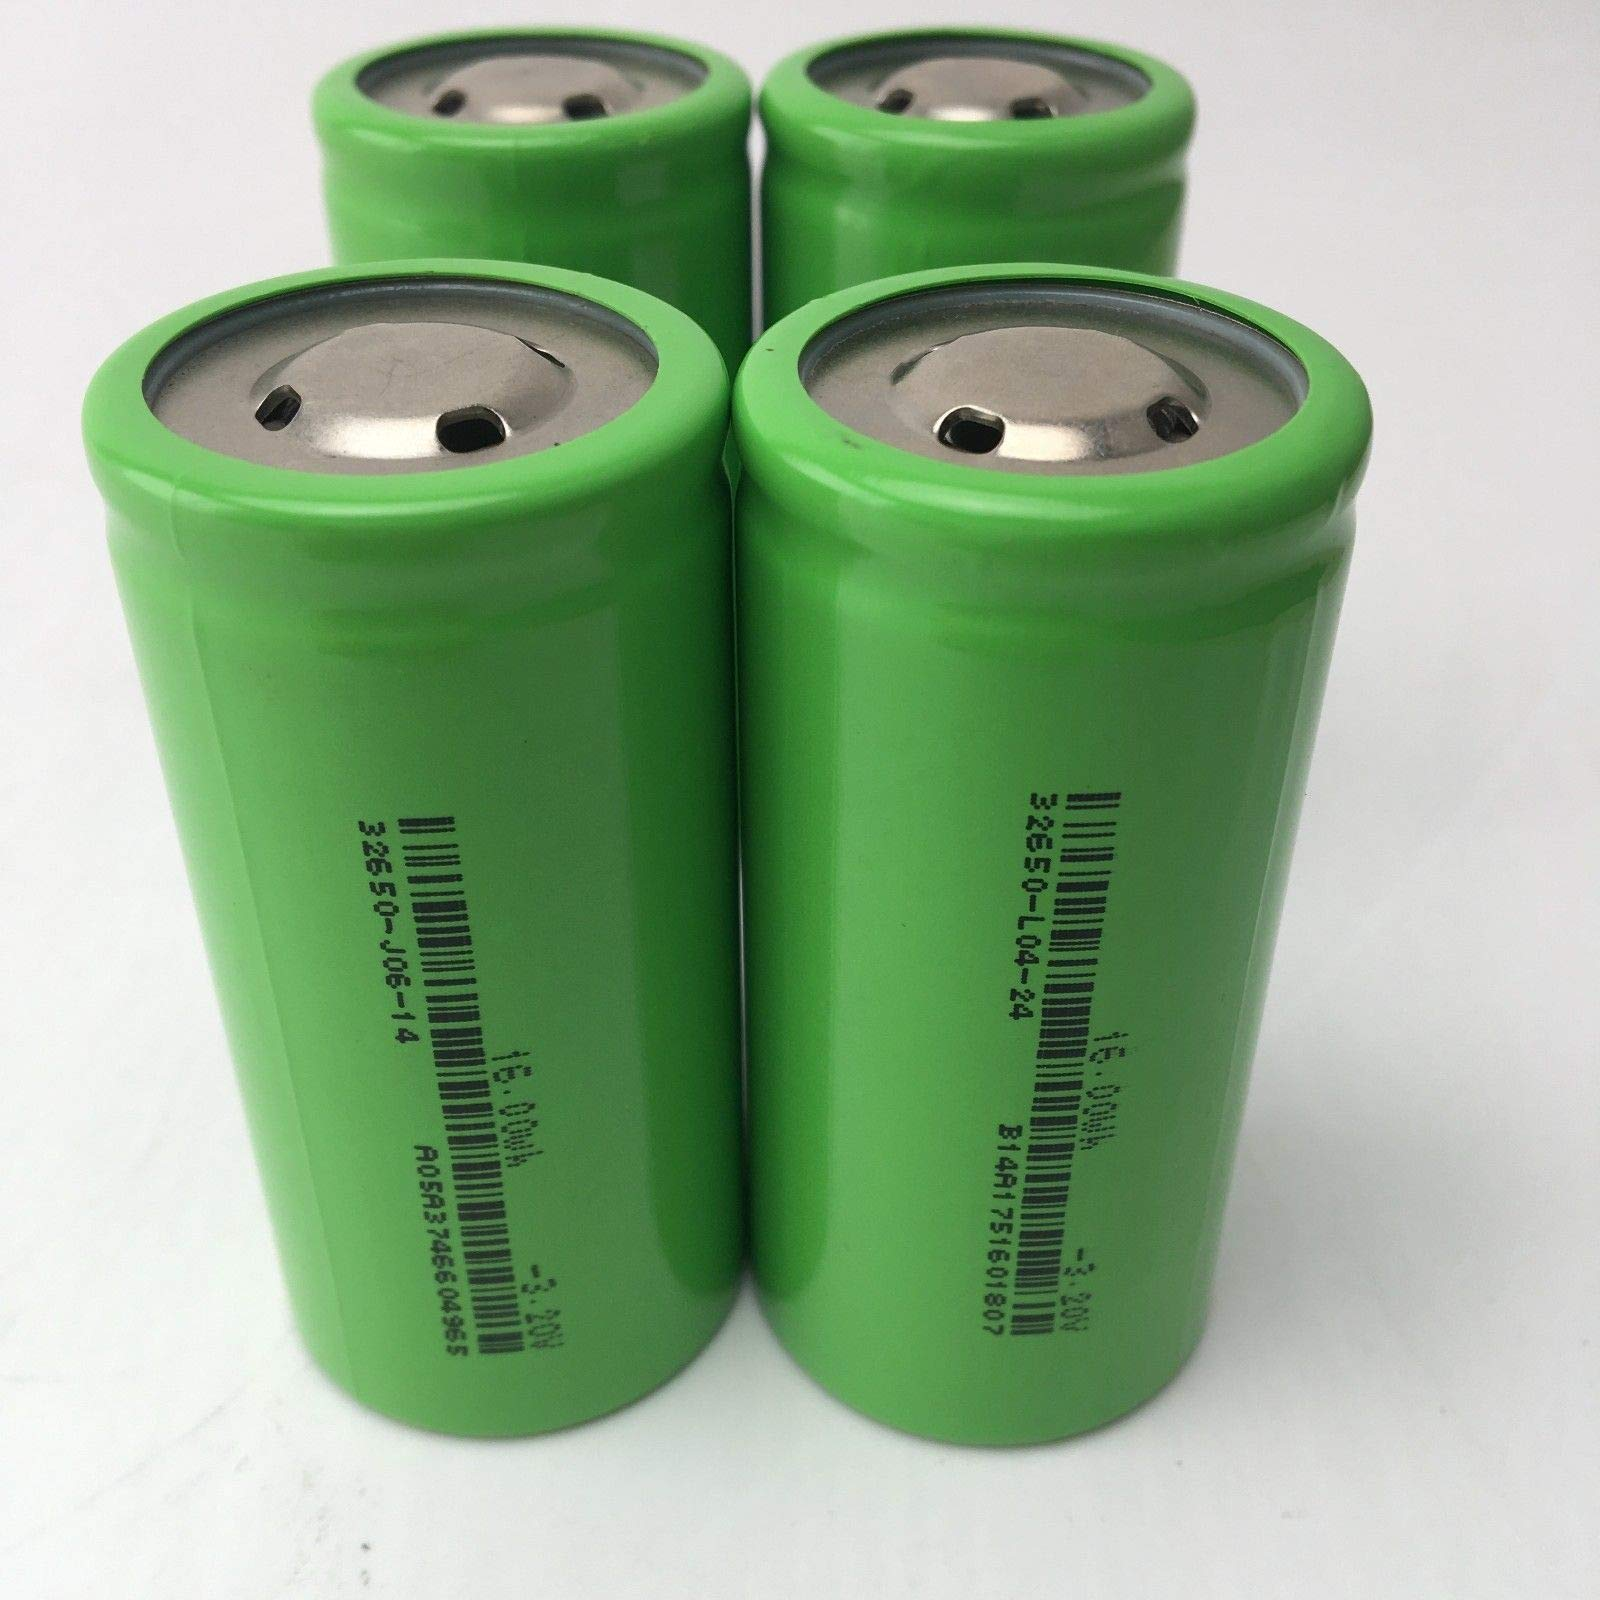 FidgetFidget Battery 4pcs 32650 5000mAh 3.2V Lifepo4 Rechargeable Li-Iron Phosphate E-bike